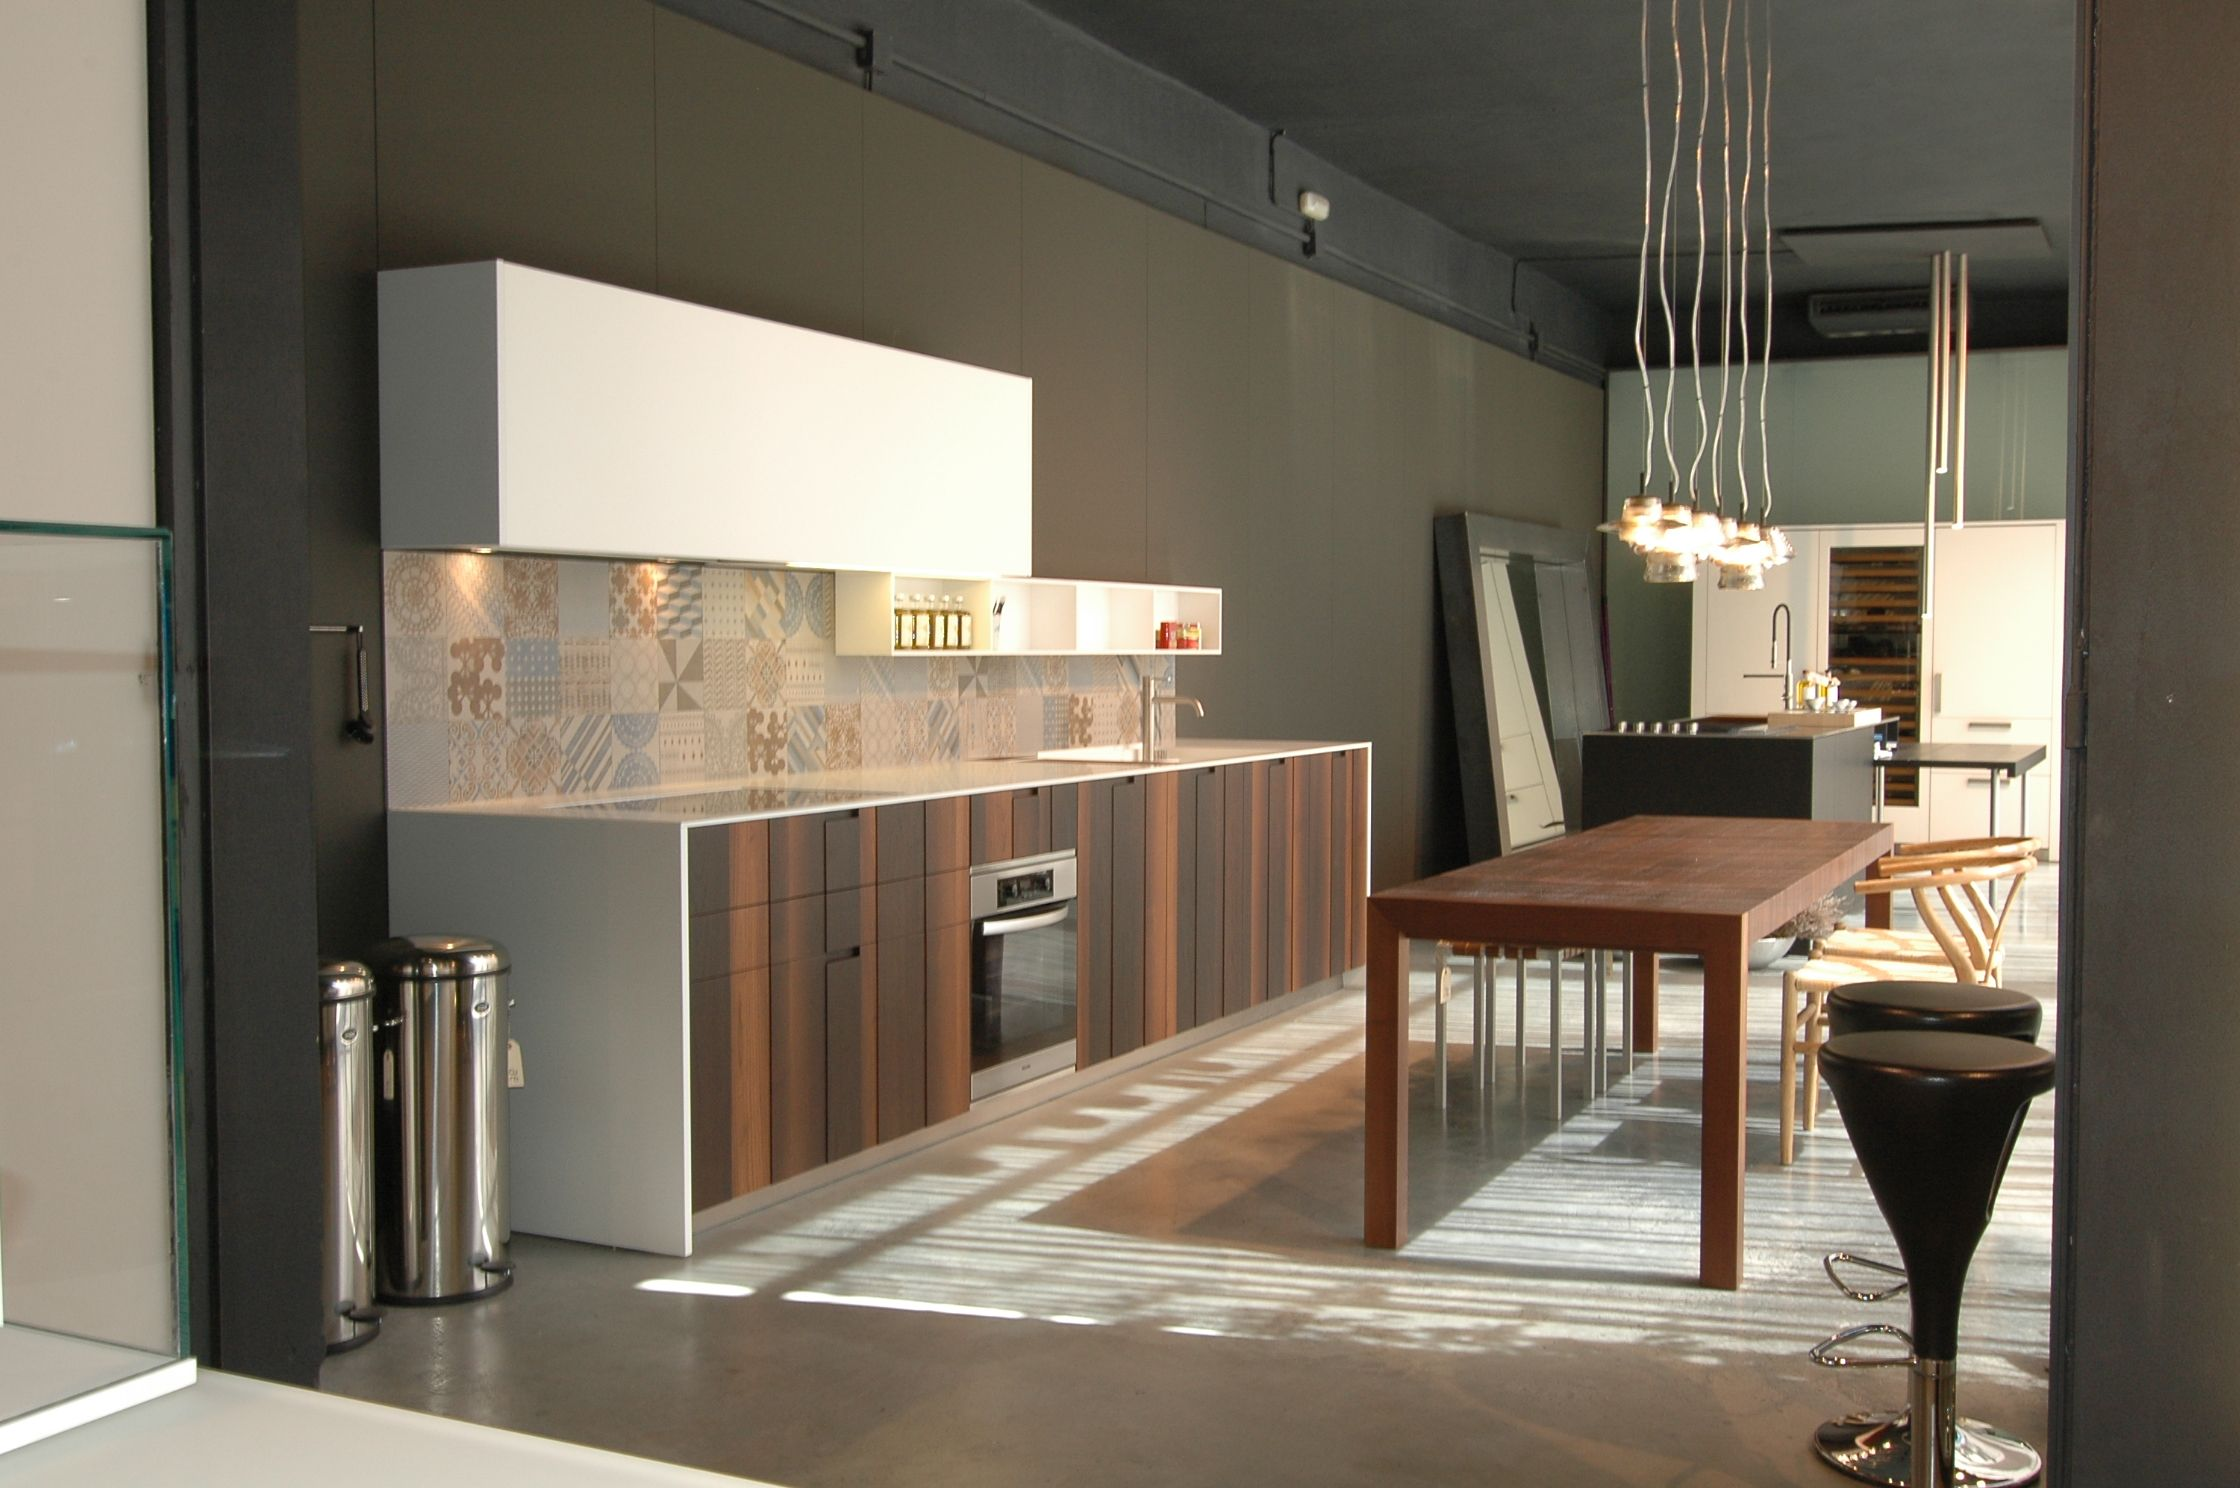 Aprile Wood 3D Boffi #kitchen.   Showroom in aquaquae.   Pinterest ...